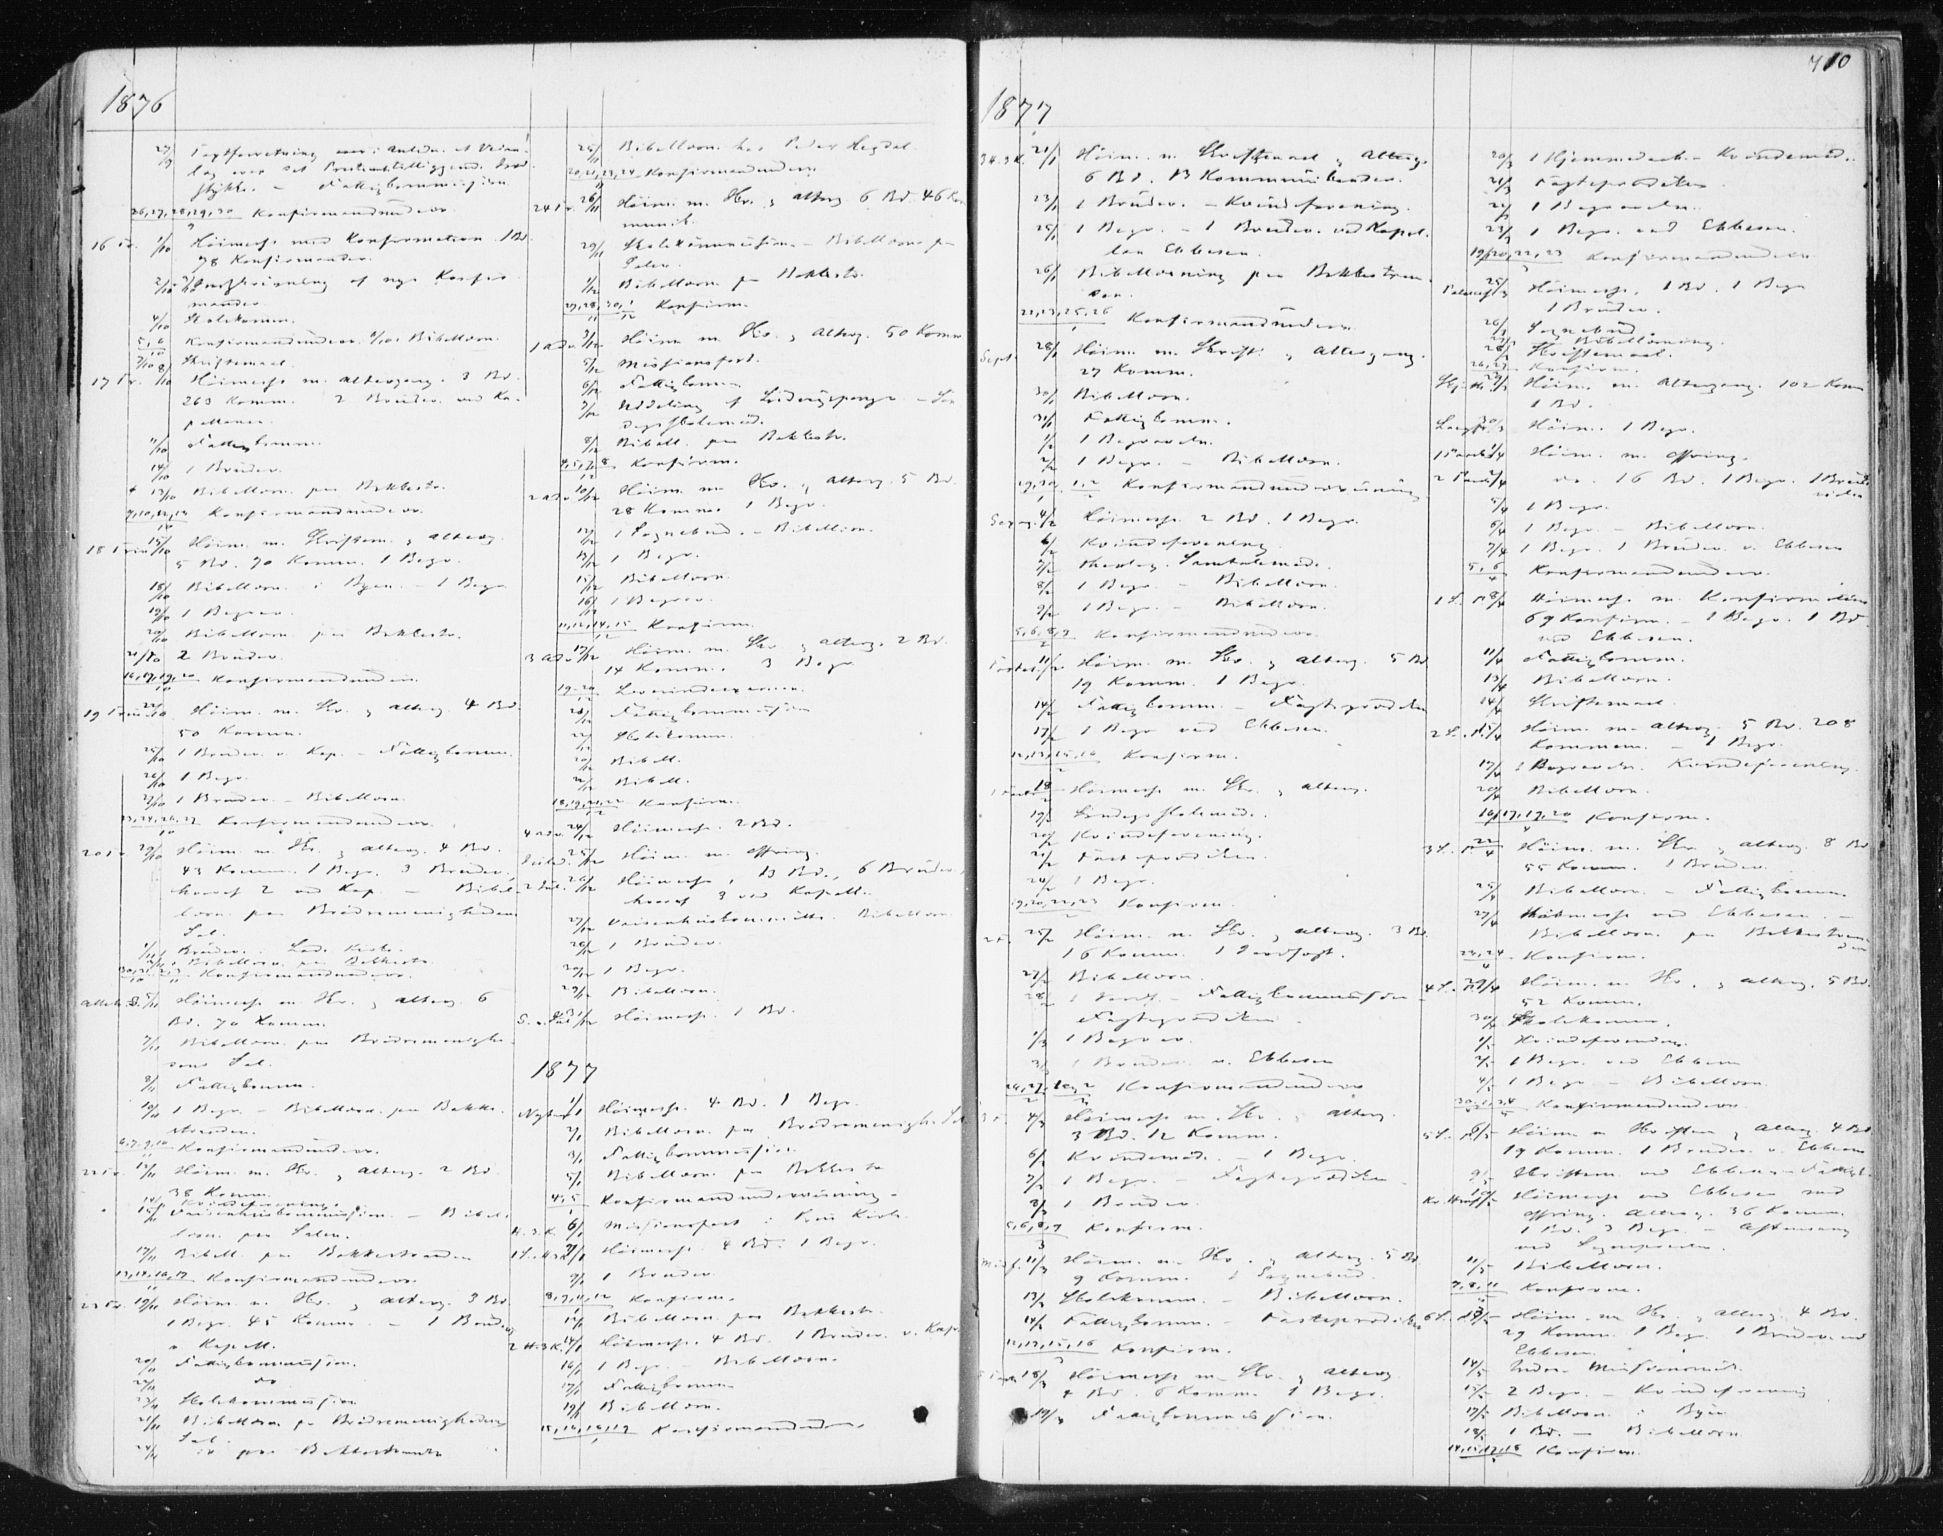 SAT, Ministerialprotokoller, klokkerbøker og fødselsregistre - Sør-Trøndelag, 604/L0186: Parish register (official) no. 604A07, 1866-1877, p. 710